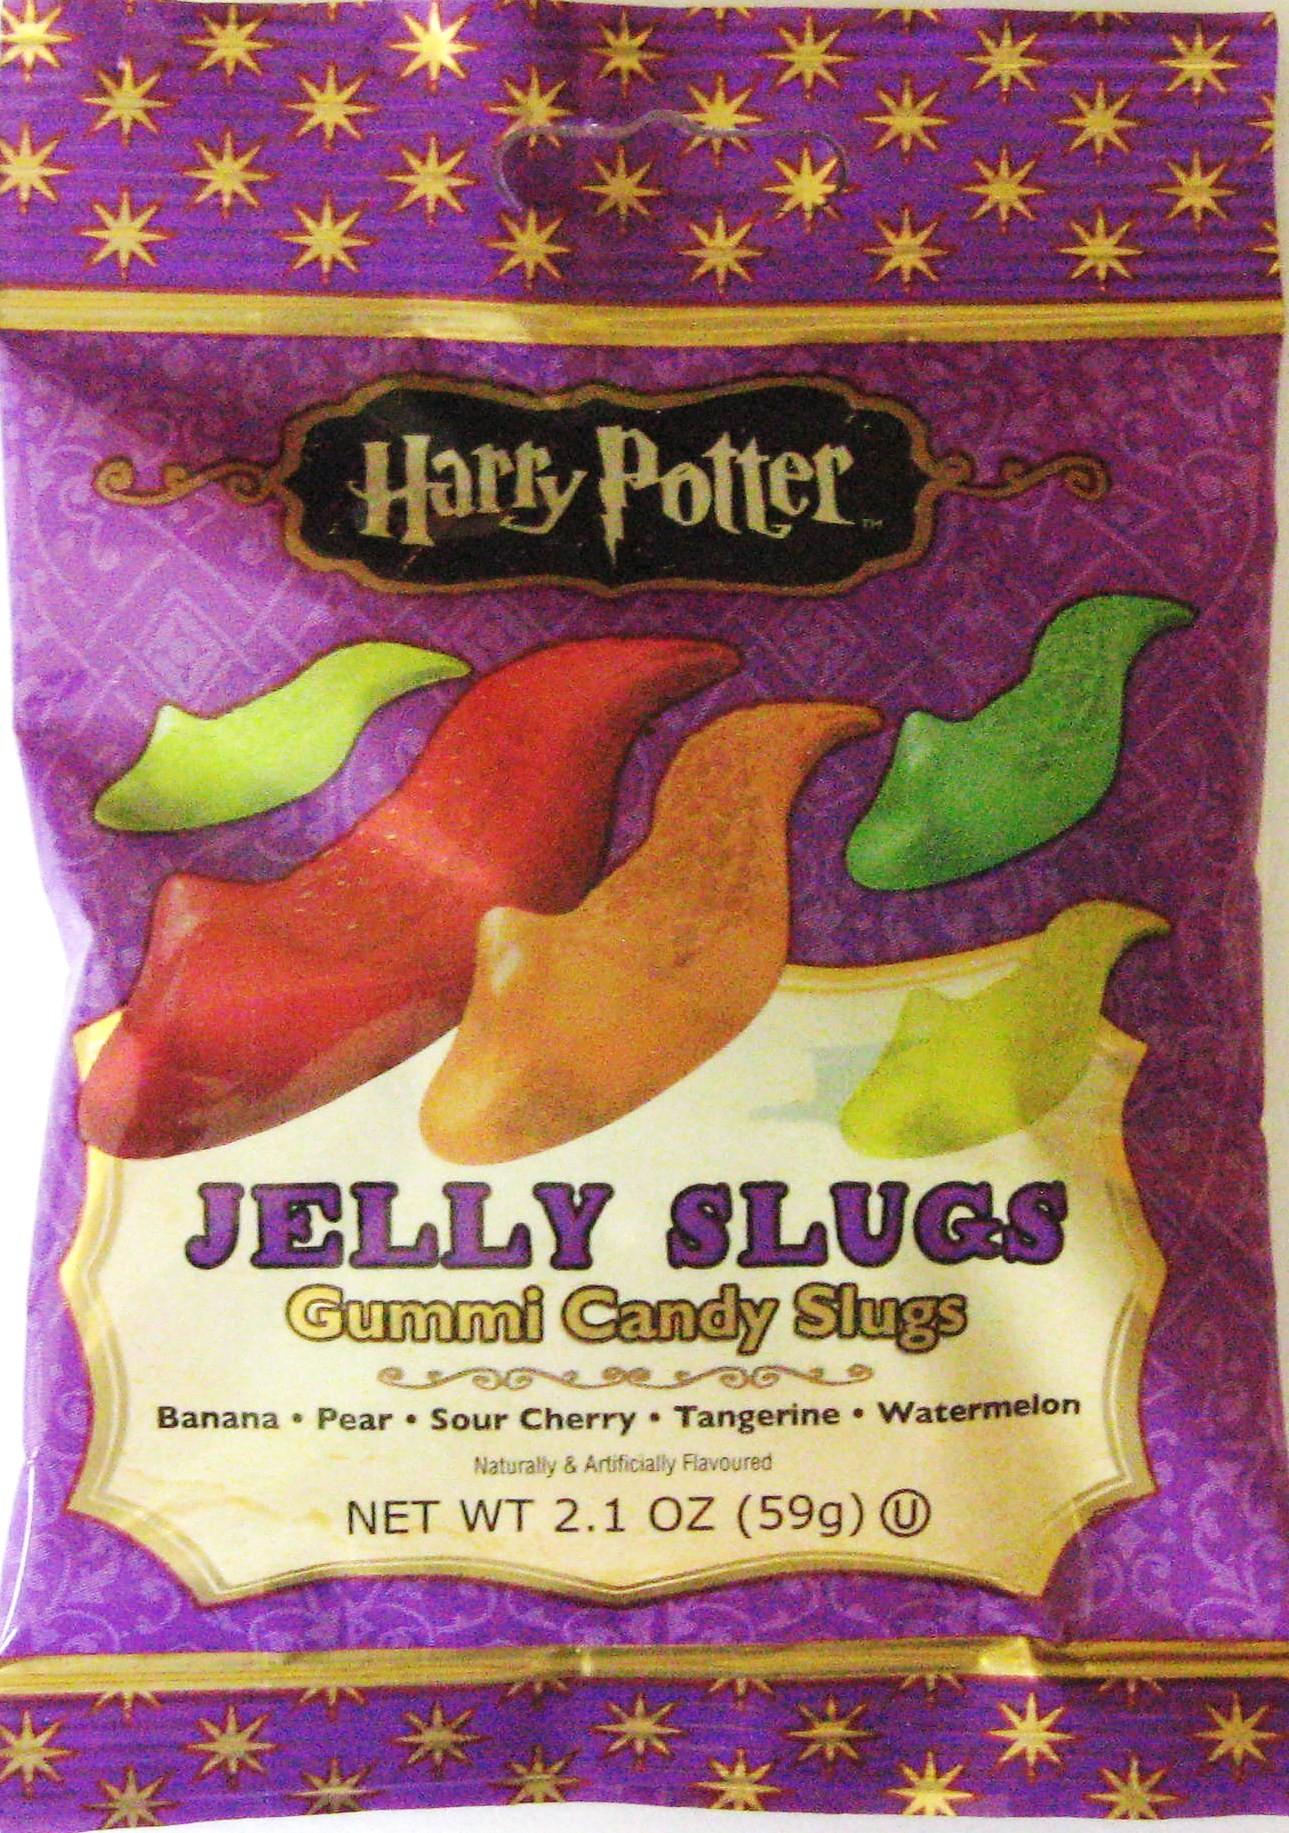 Harry Potter™ by Jelly Belly - Jelly Slugs Слизни мармеладные Хеллоуин Гарри Поттер 54 гр